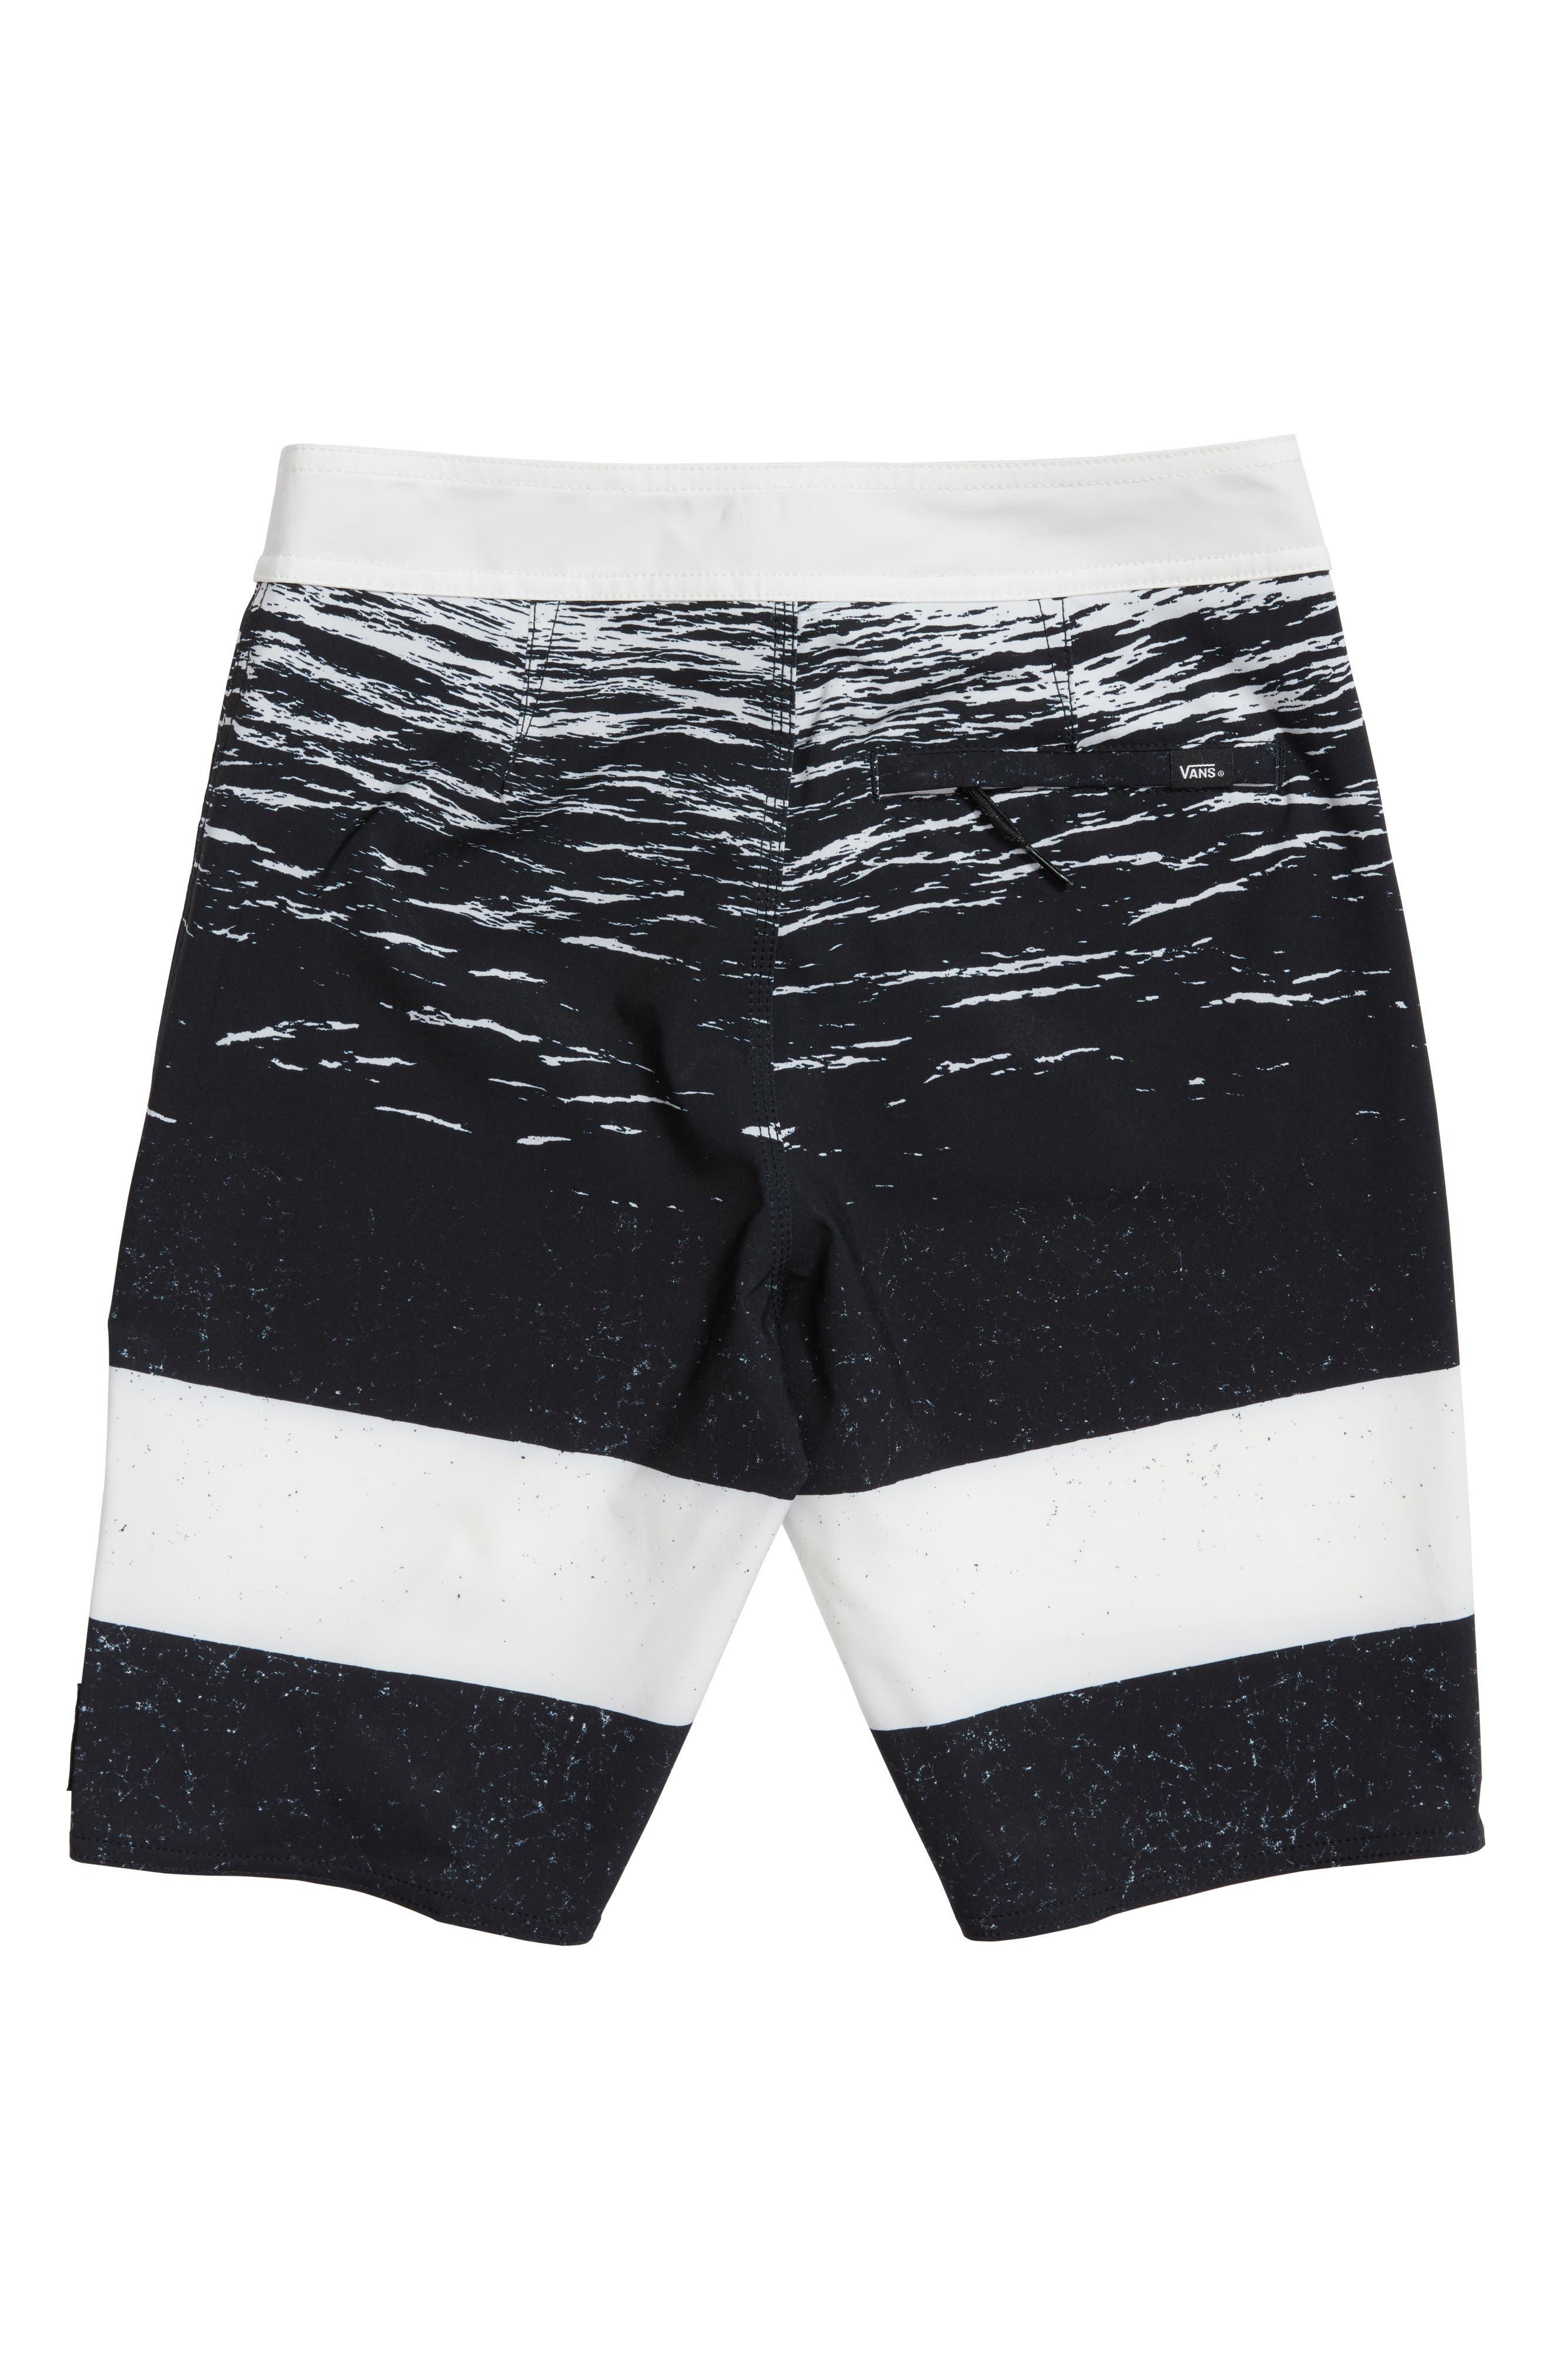 Era Board Shorts,                             Alternate thumbnail 2, color,                             White Dark Water